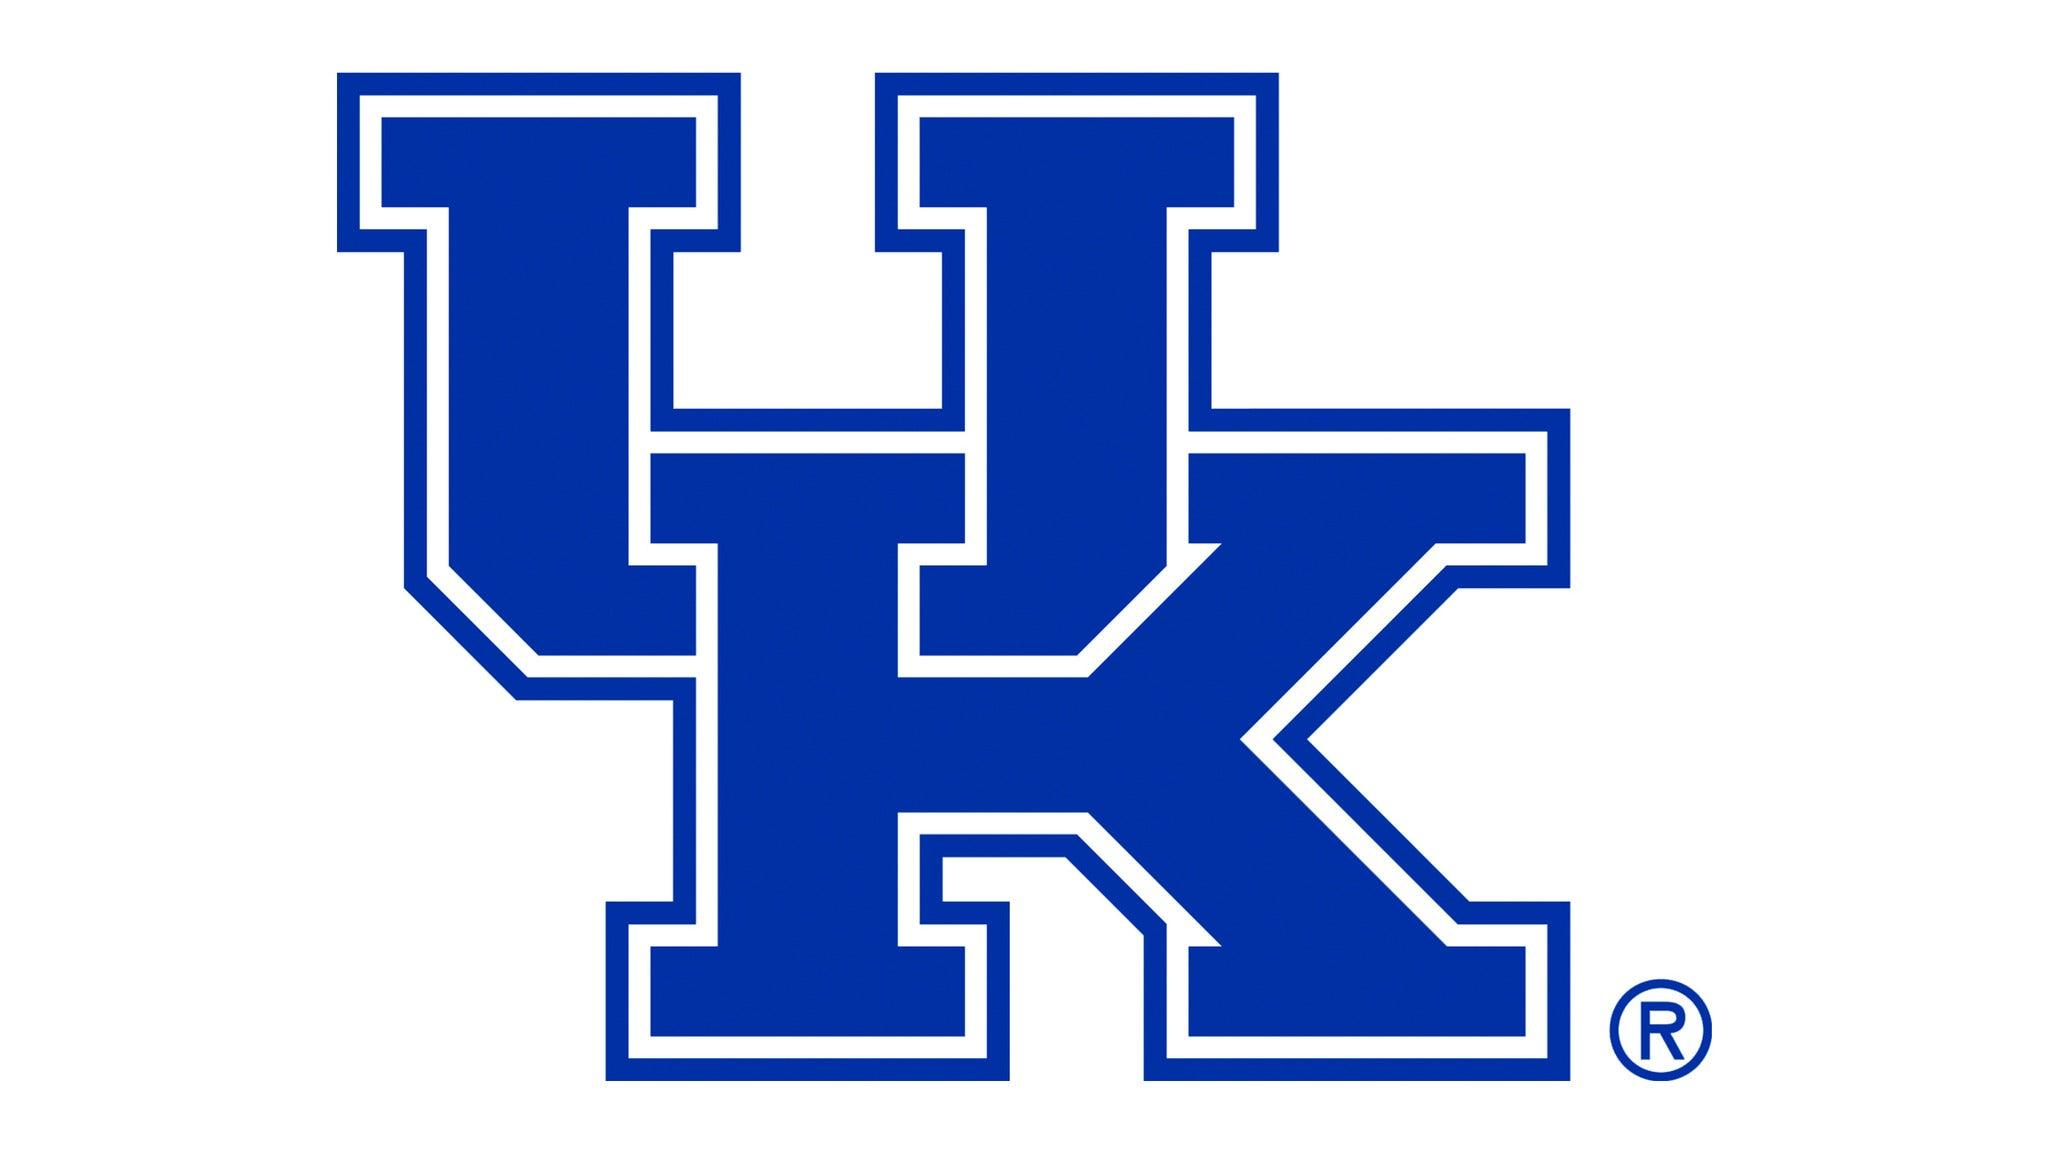 Kentucky Wildcats Football vs. Mizzou Tigers Football